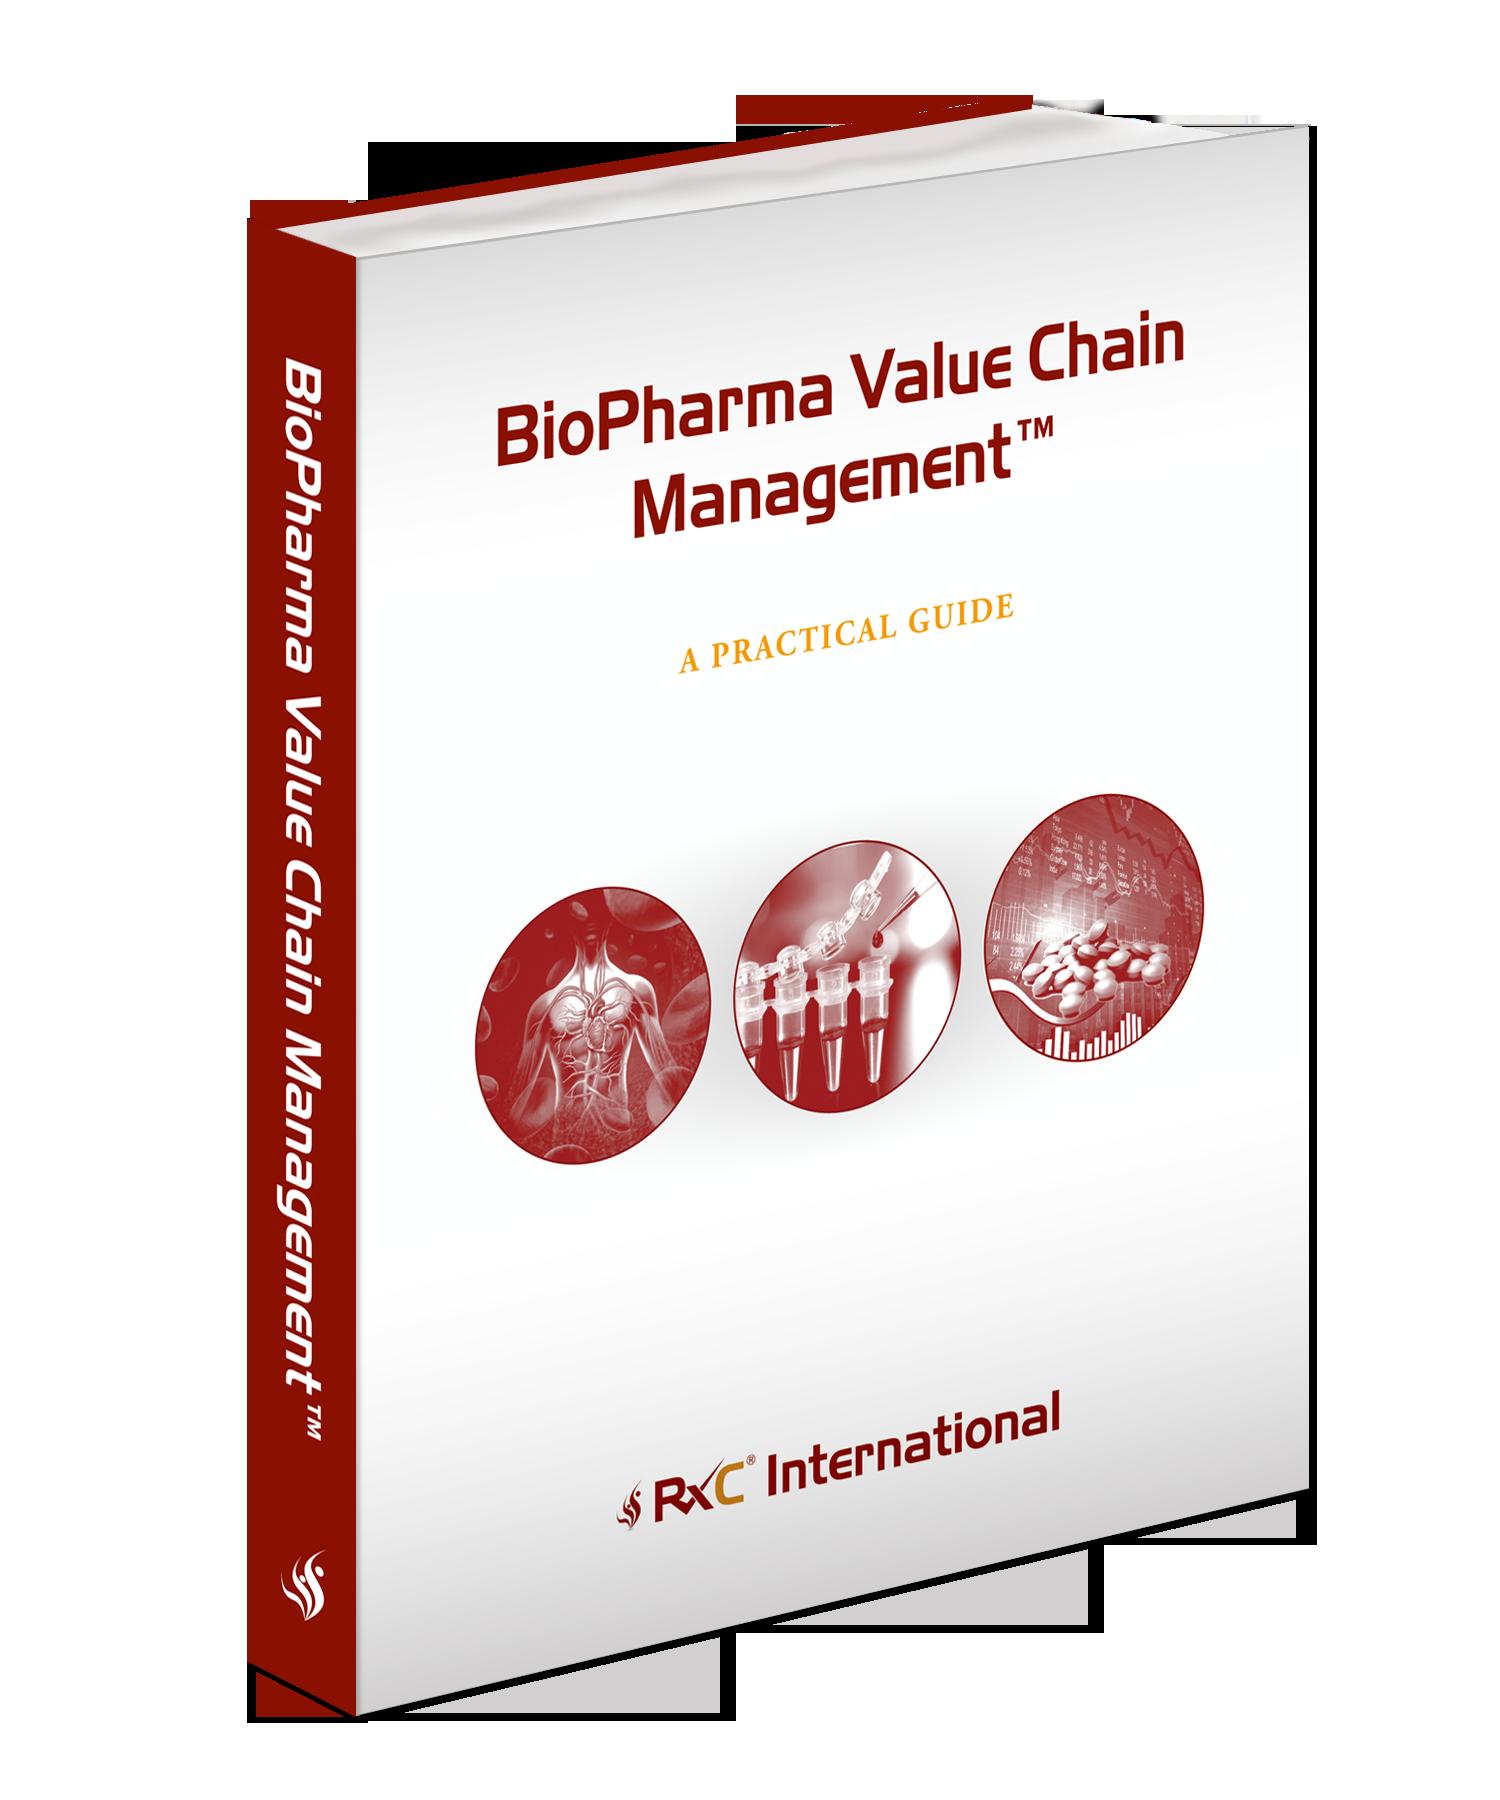 BioPharma Value Chain Management